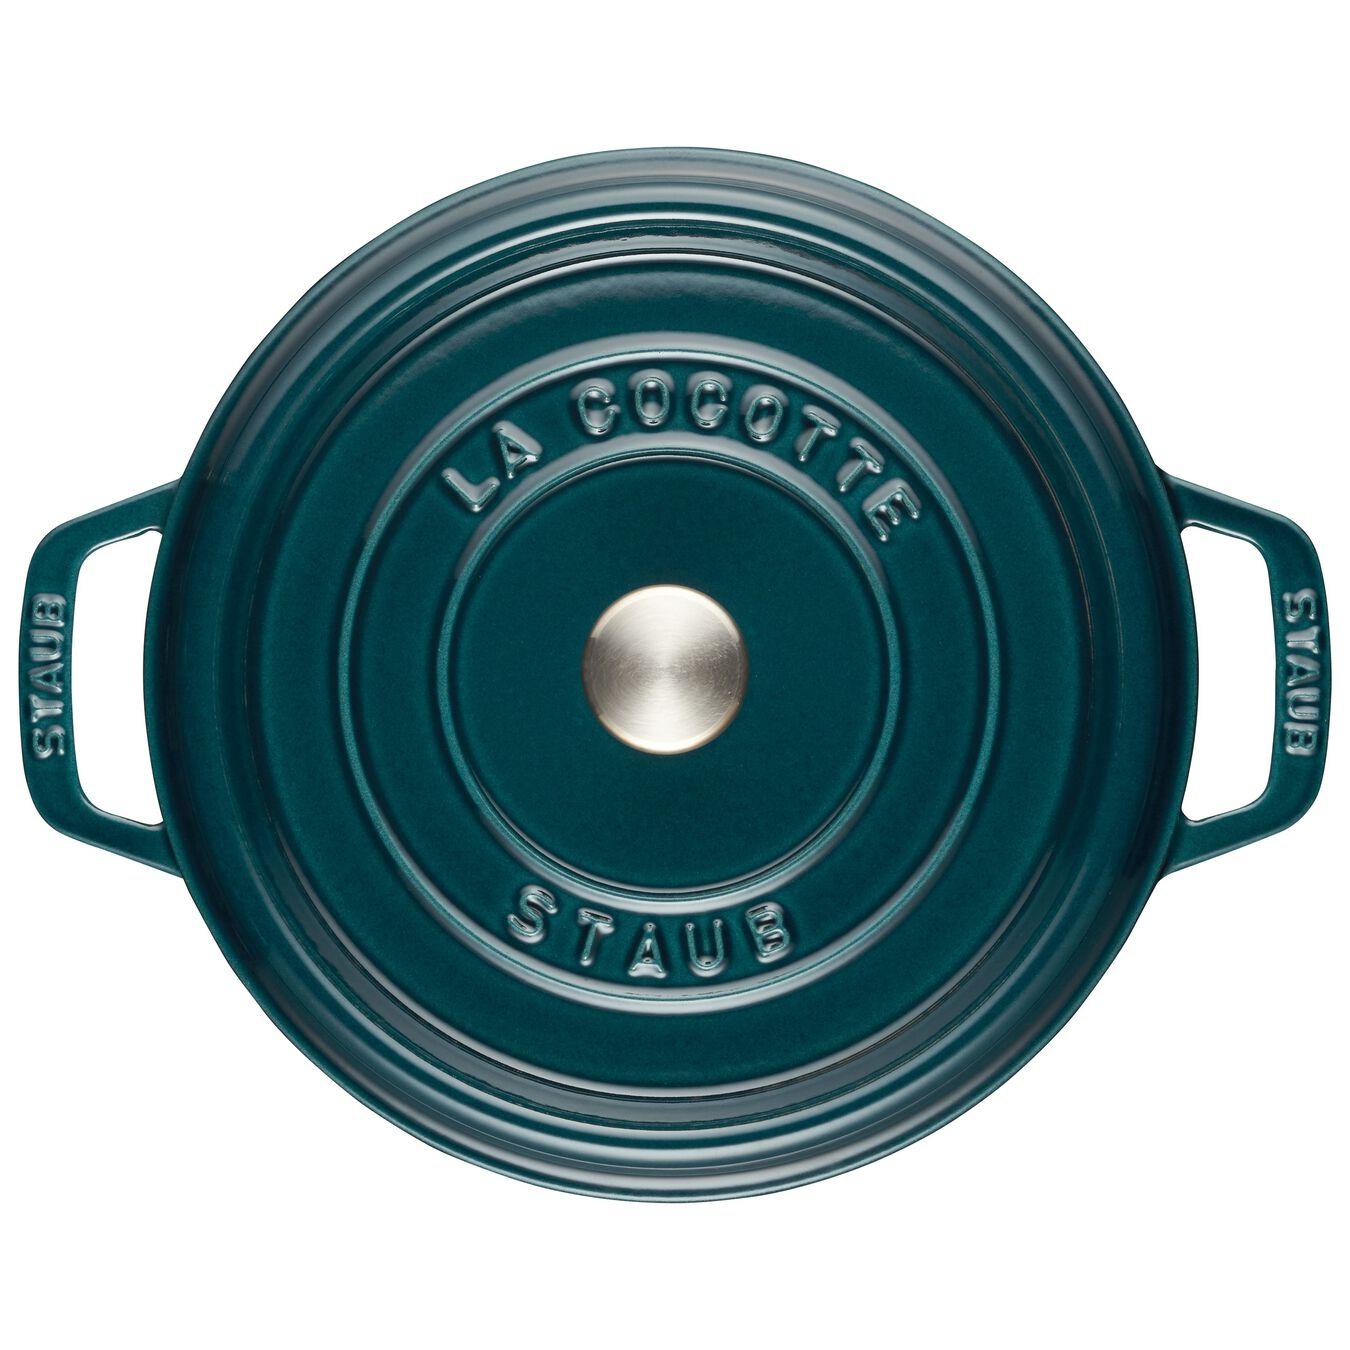 Cocotte 24 cm, rund, La-Mer, Gusseisen,,large 2